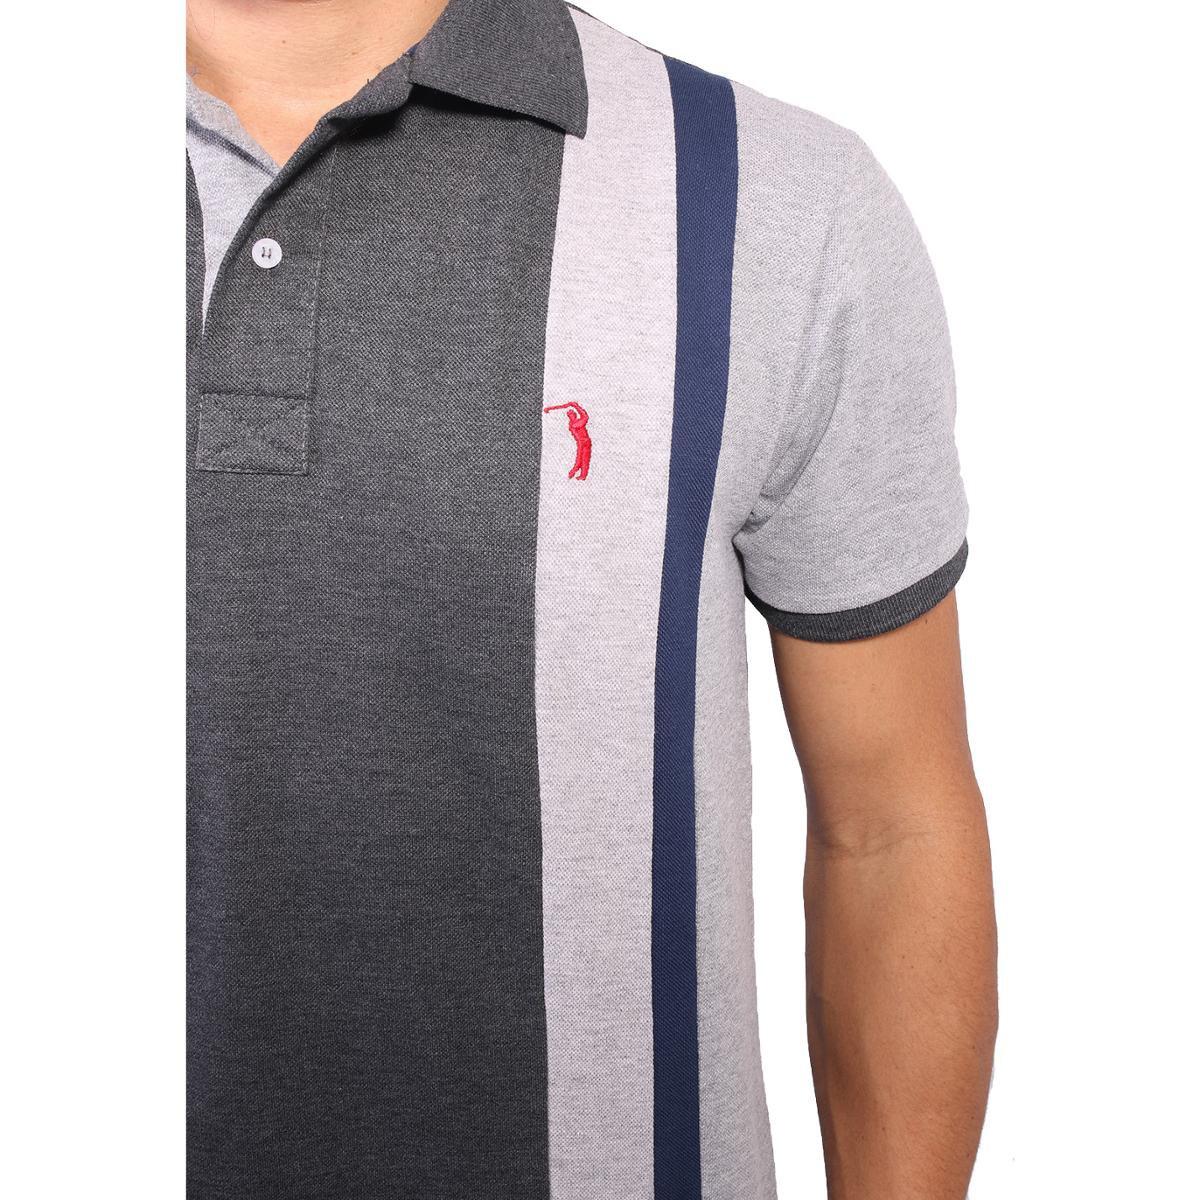 Camisa Polo Golf Club Trios Masculina - Chumbo e Cinza - Compre ... e15106e5fdb20